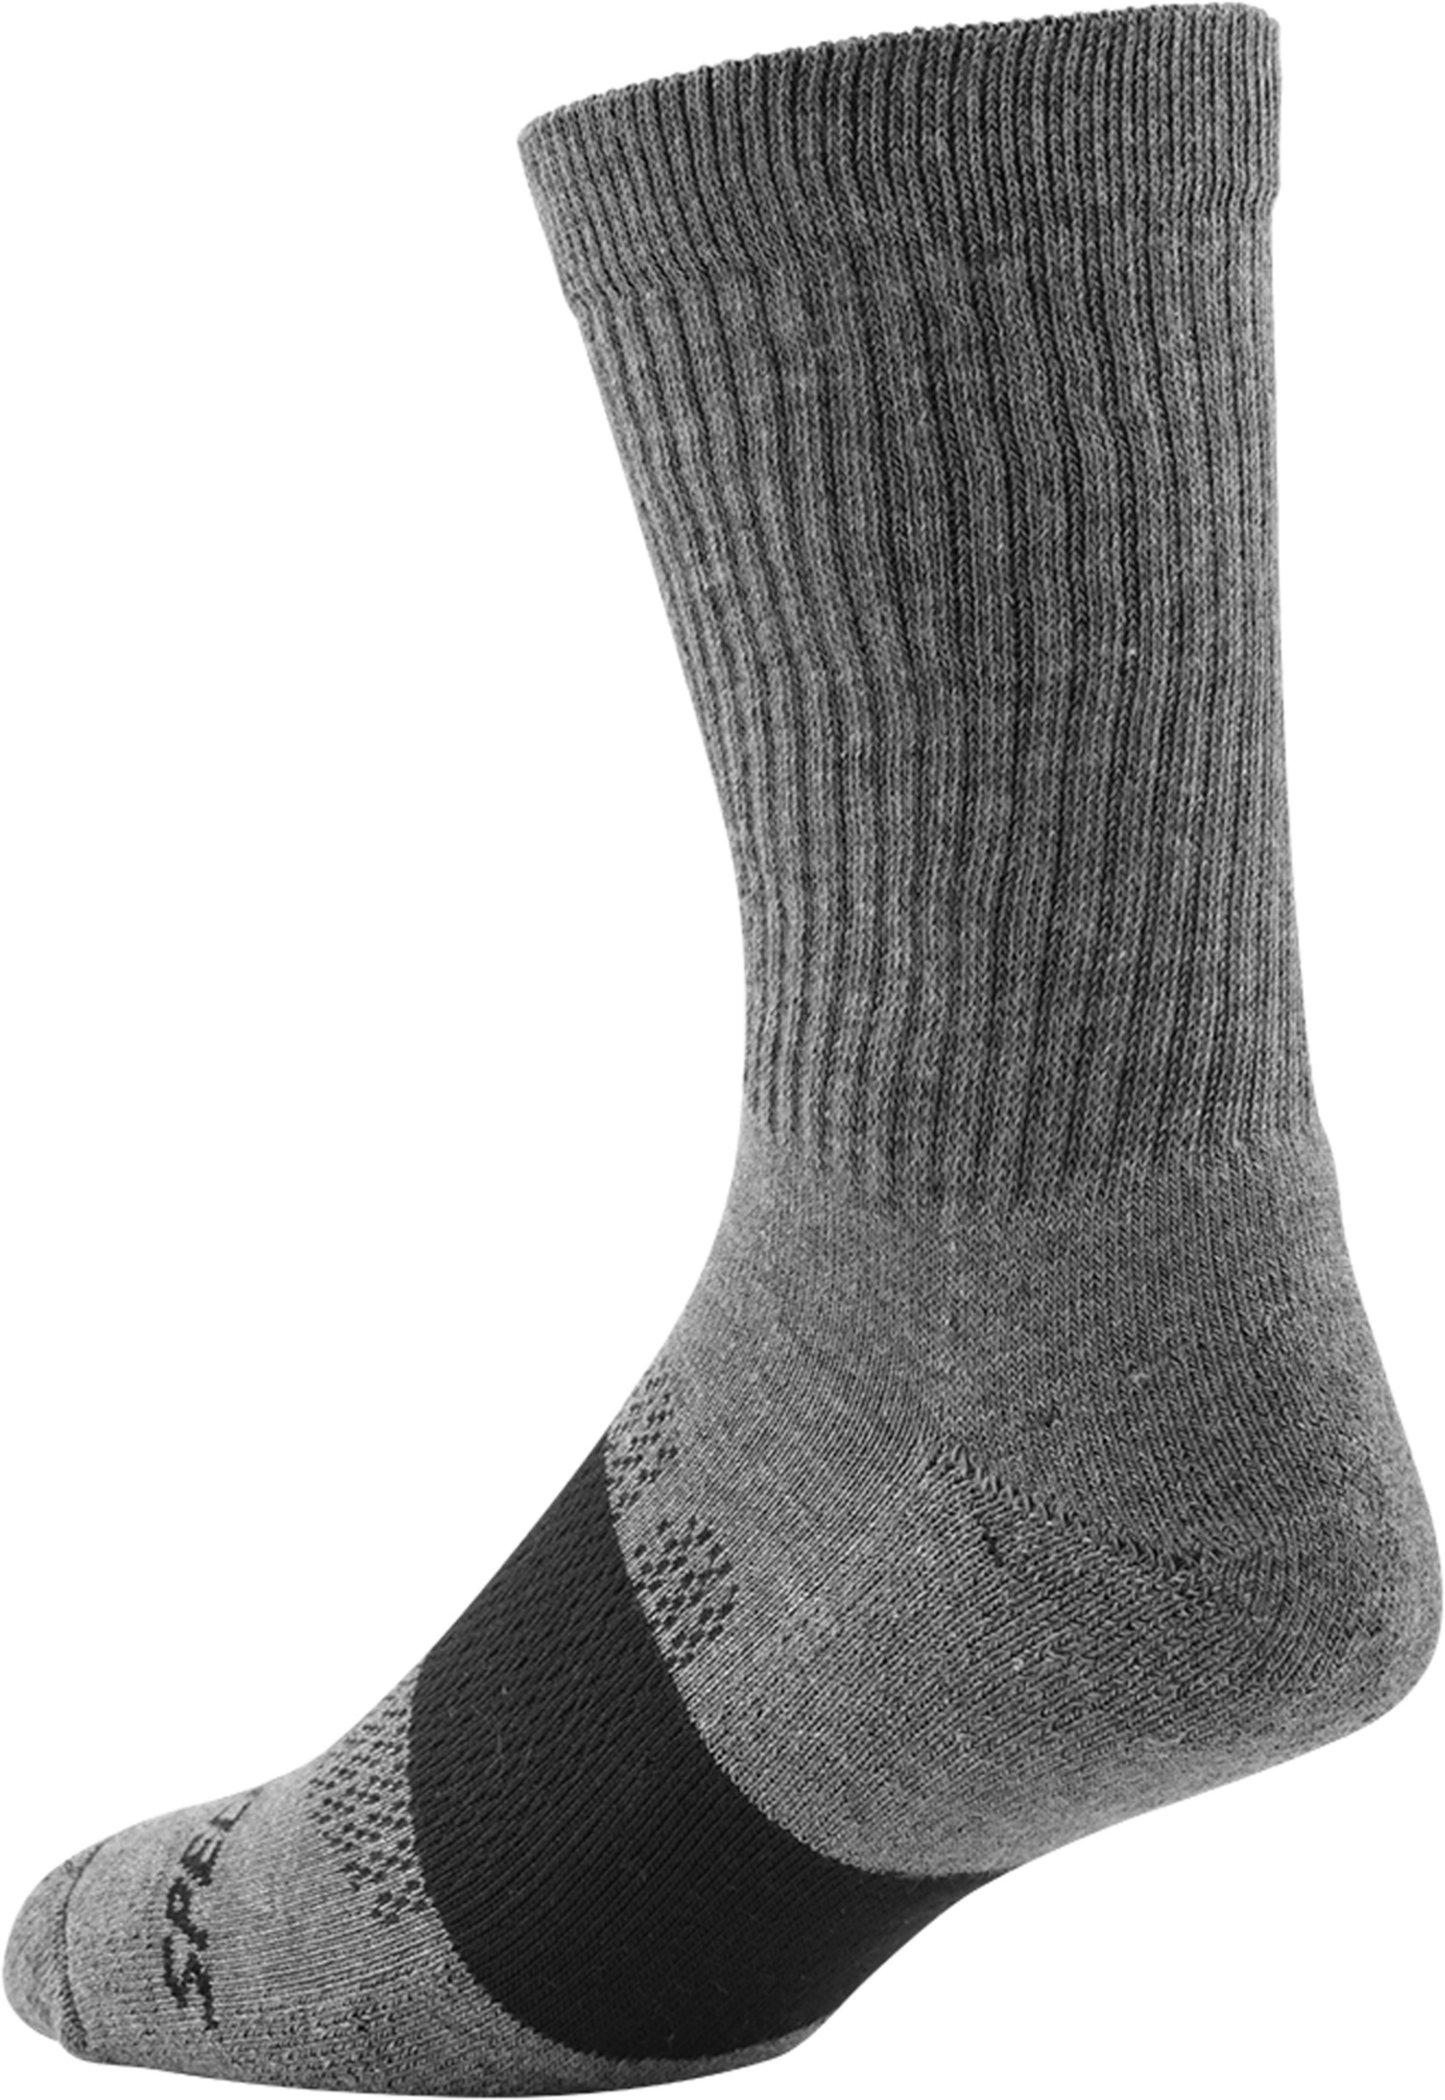 Specialized Women´s Mountain Tall Socks Light Grey Heather M/L - Alpha Bikes